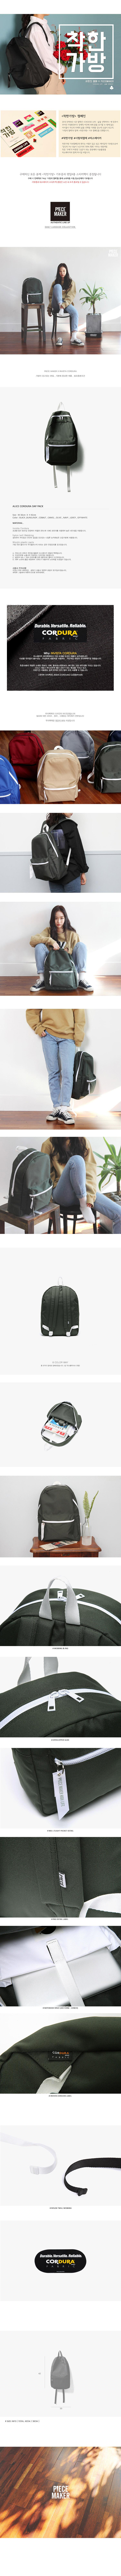 ALICE CORDURA DAY PACK (OLIVE)39,000원-피스메이커패션잡화, 가방, 백팩, 패브릭백팩바보사랑ALICE CORDURA DAY PACK (OLIVE)39,000원-피스메이커패션잡화, 가방, 백팩, 패브릭백팩바보사랑